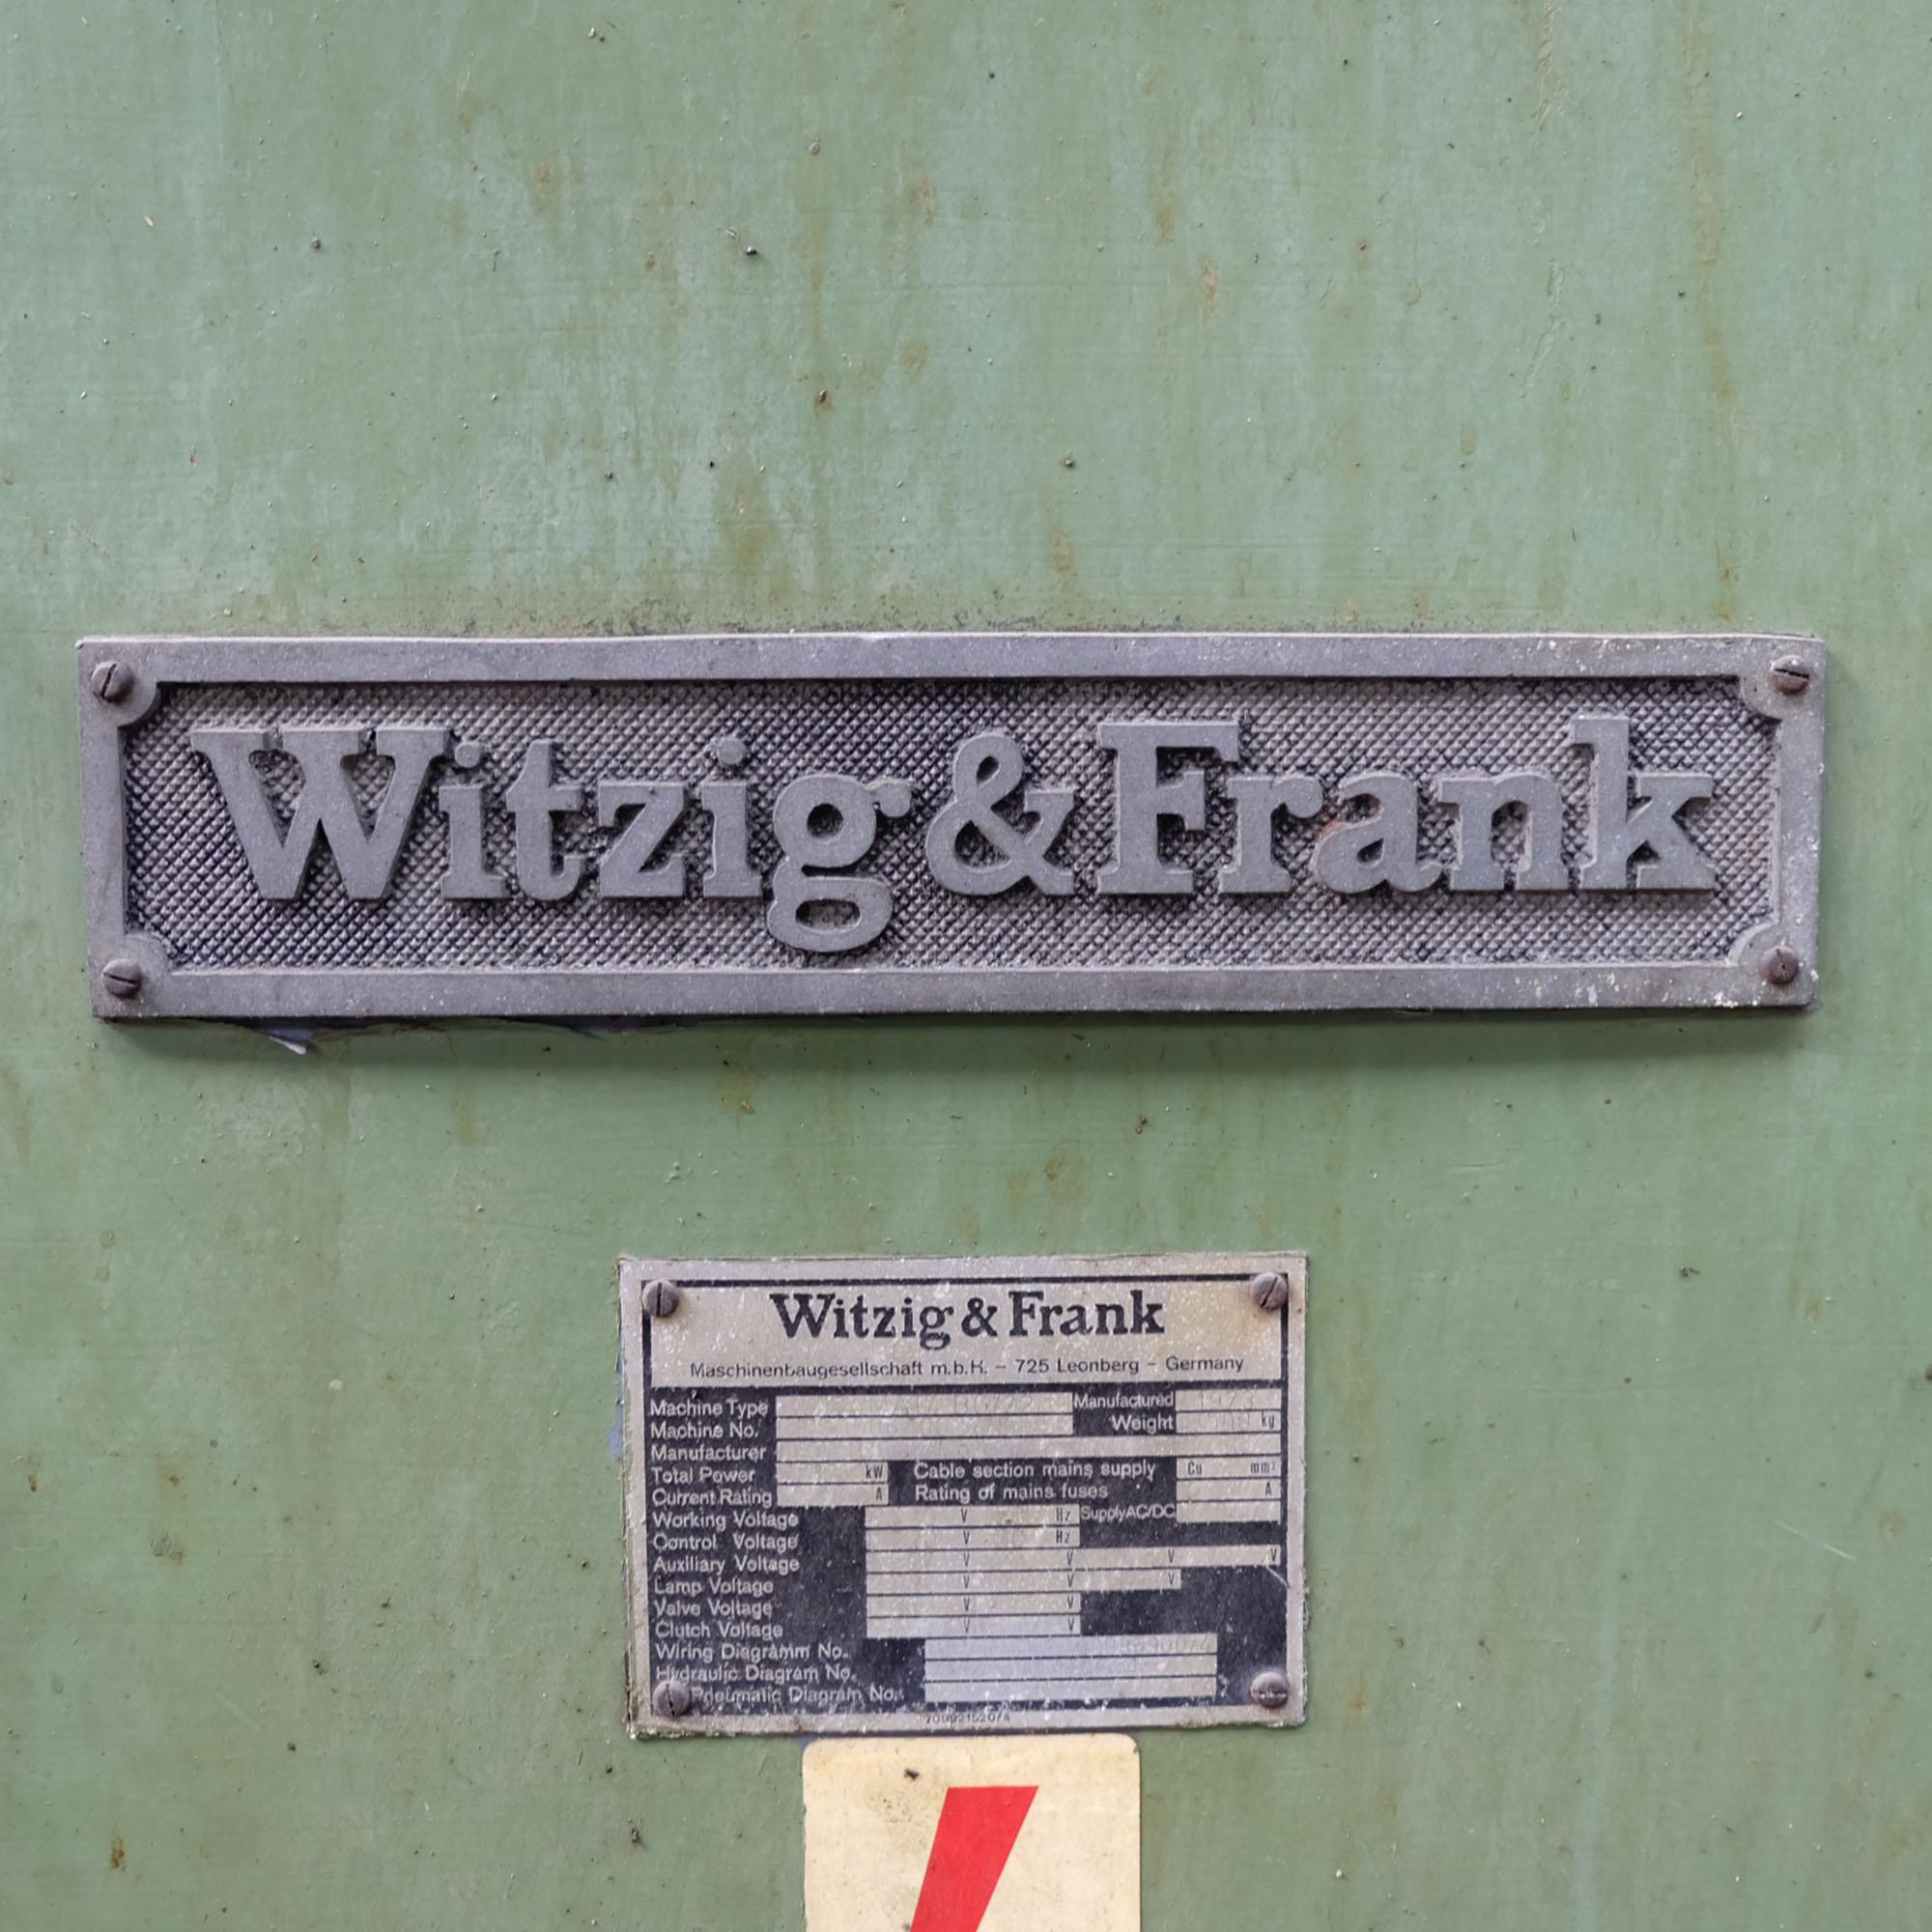 Witzig & Frank Model Adamat 4 BG/22. Six Station Indexing Rotary Transfer Machine. - Image 9 of 11